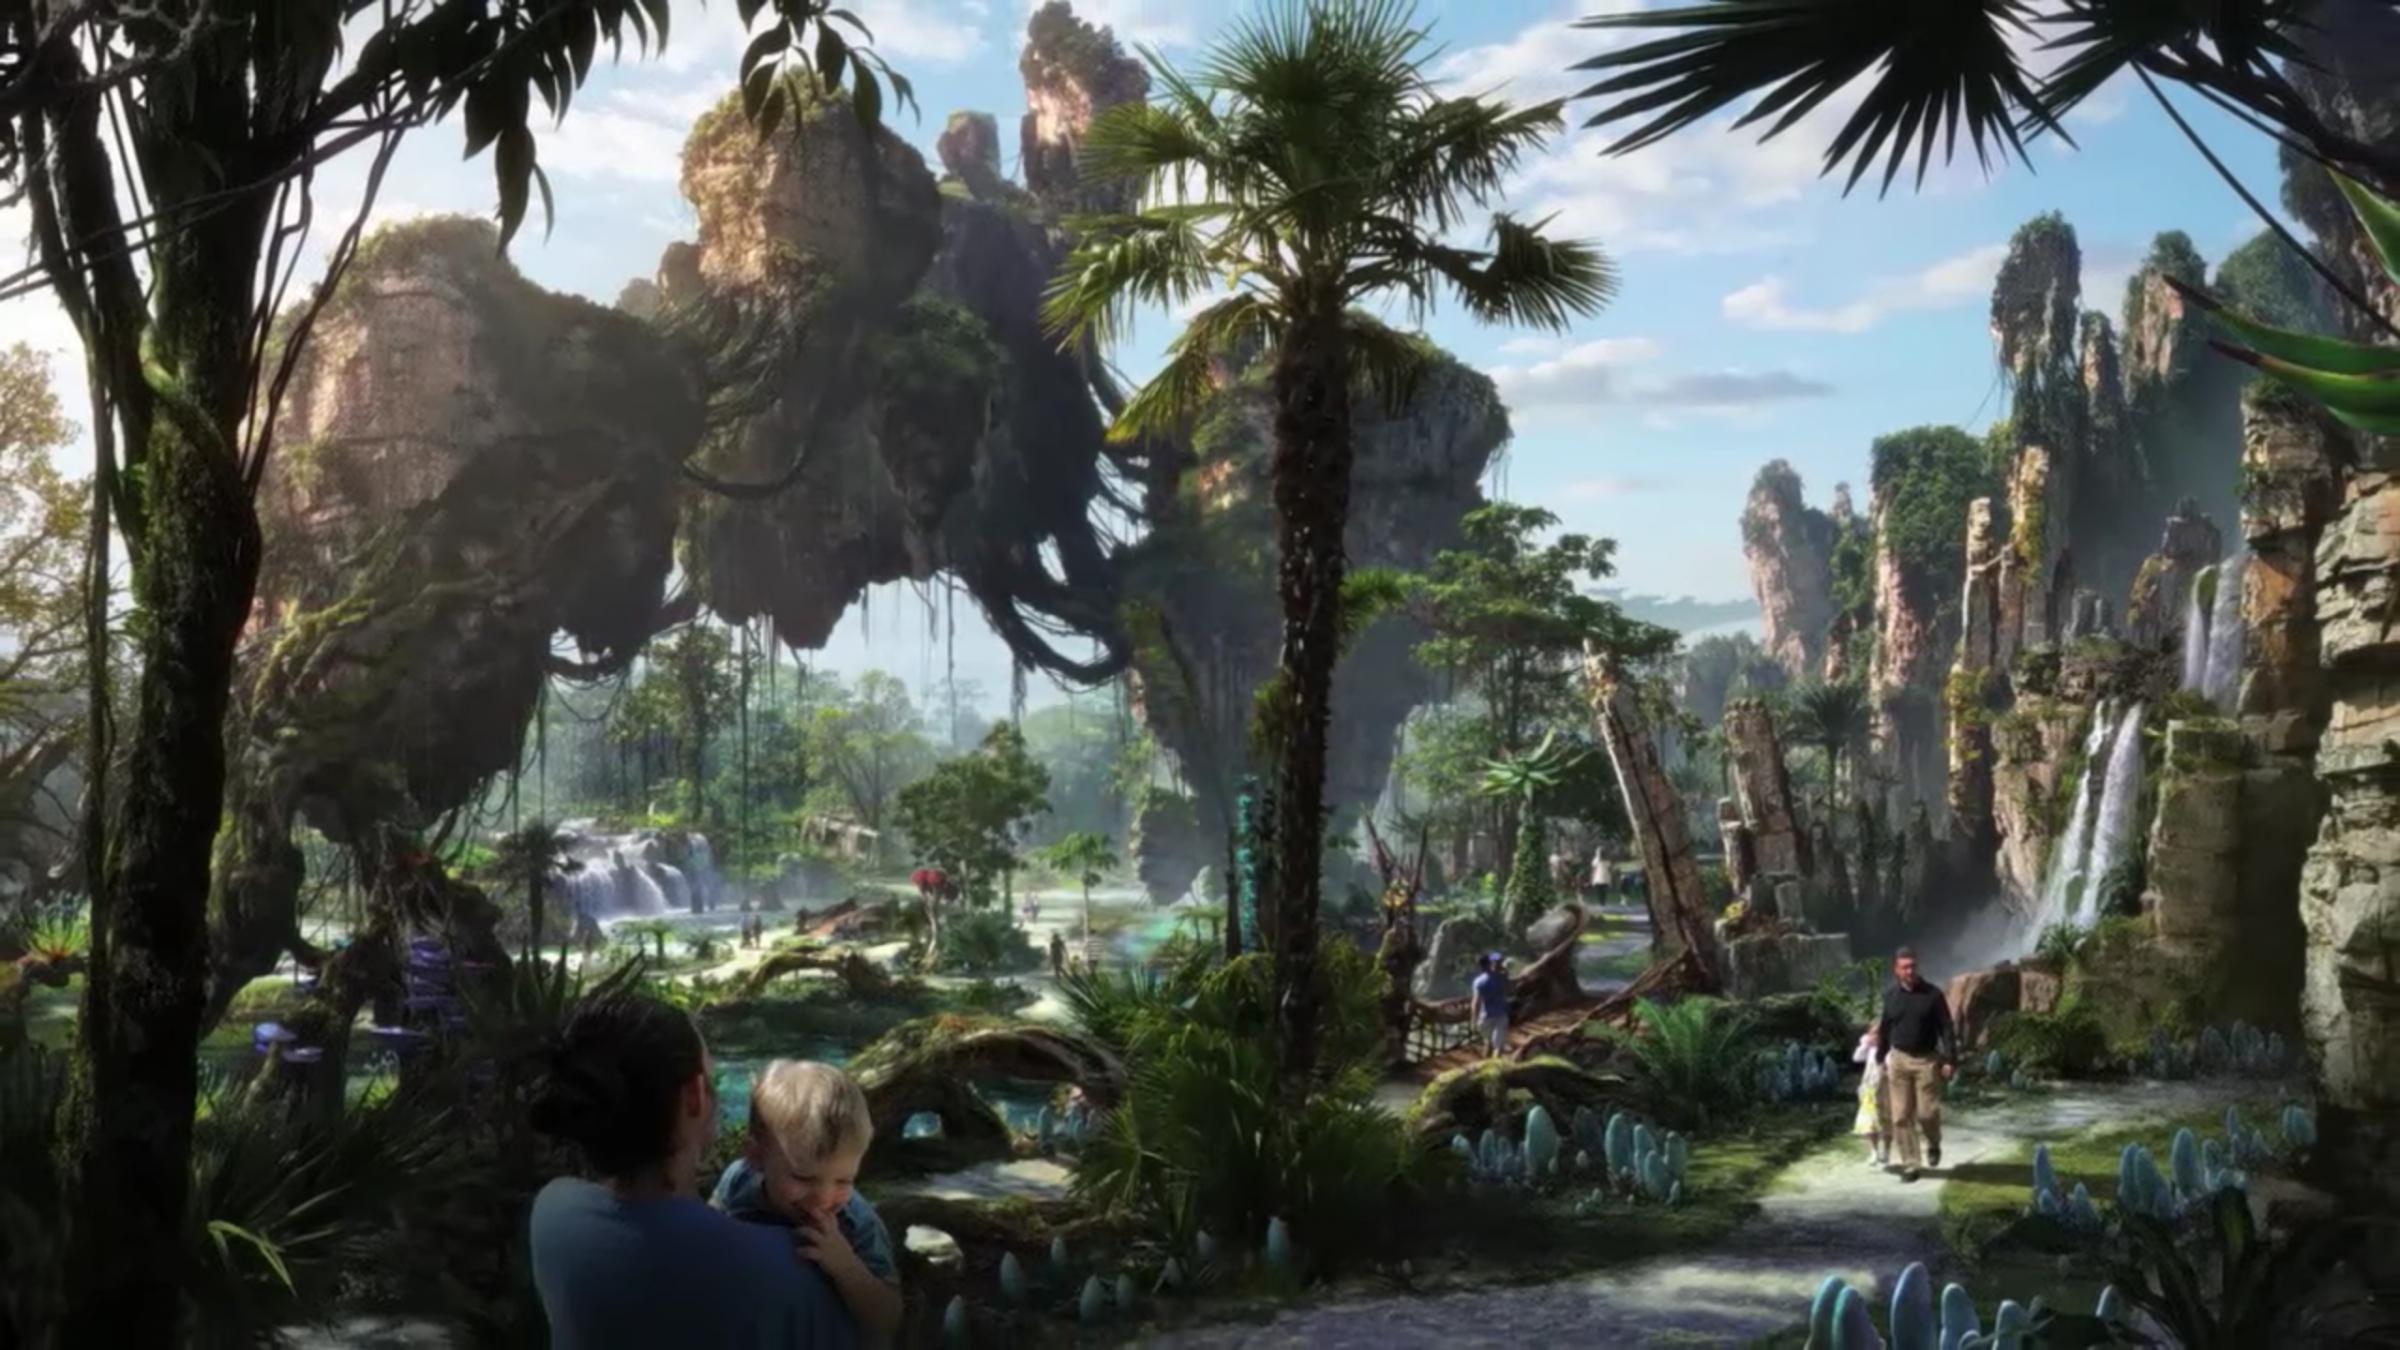 4 ways Harry Potter influenced Avatar Land